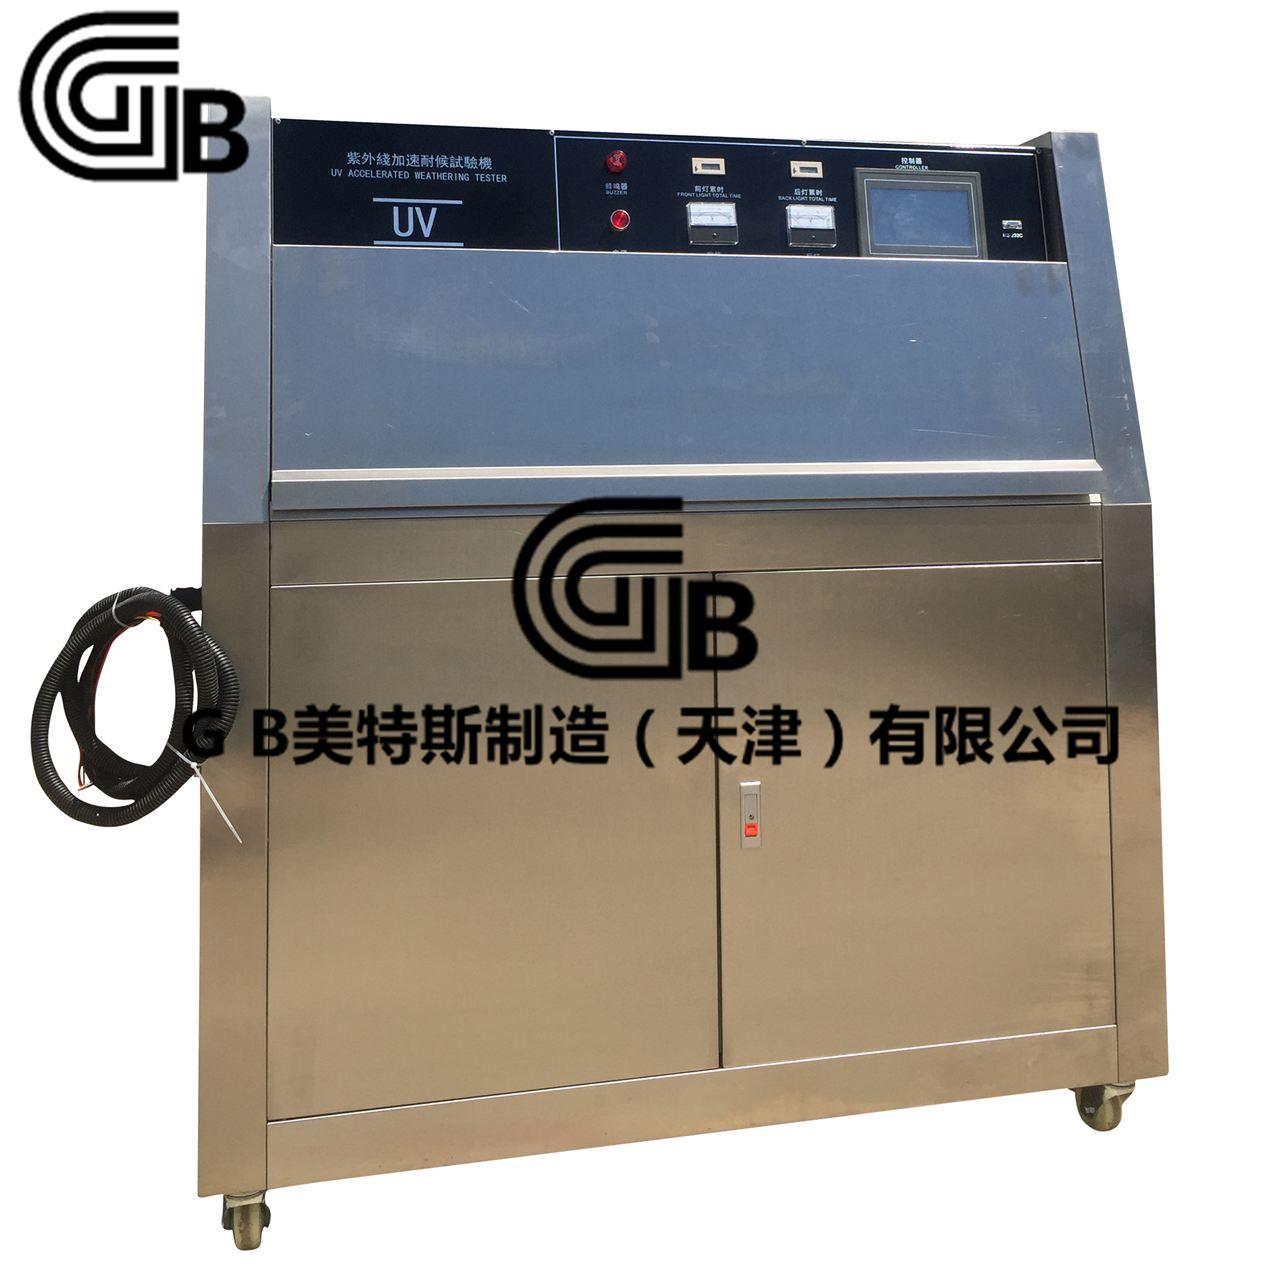 GB土工合成材料抗氧化性能试验记录表电子版 免费下载